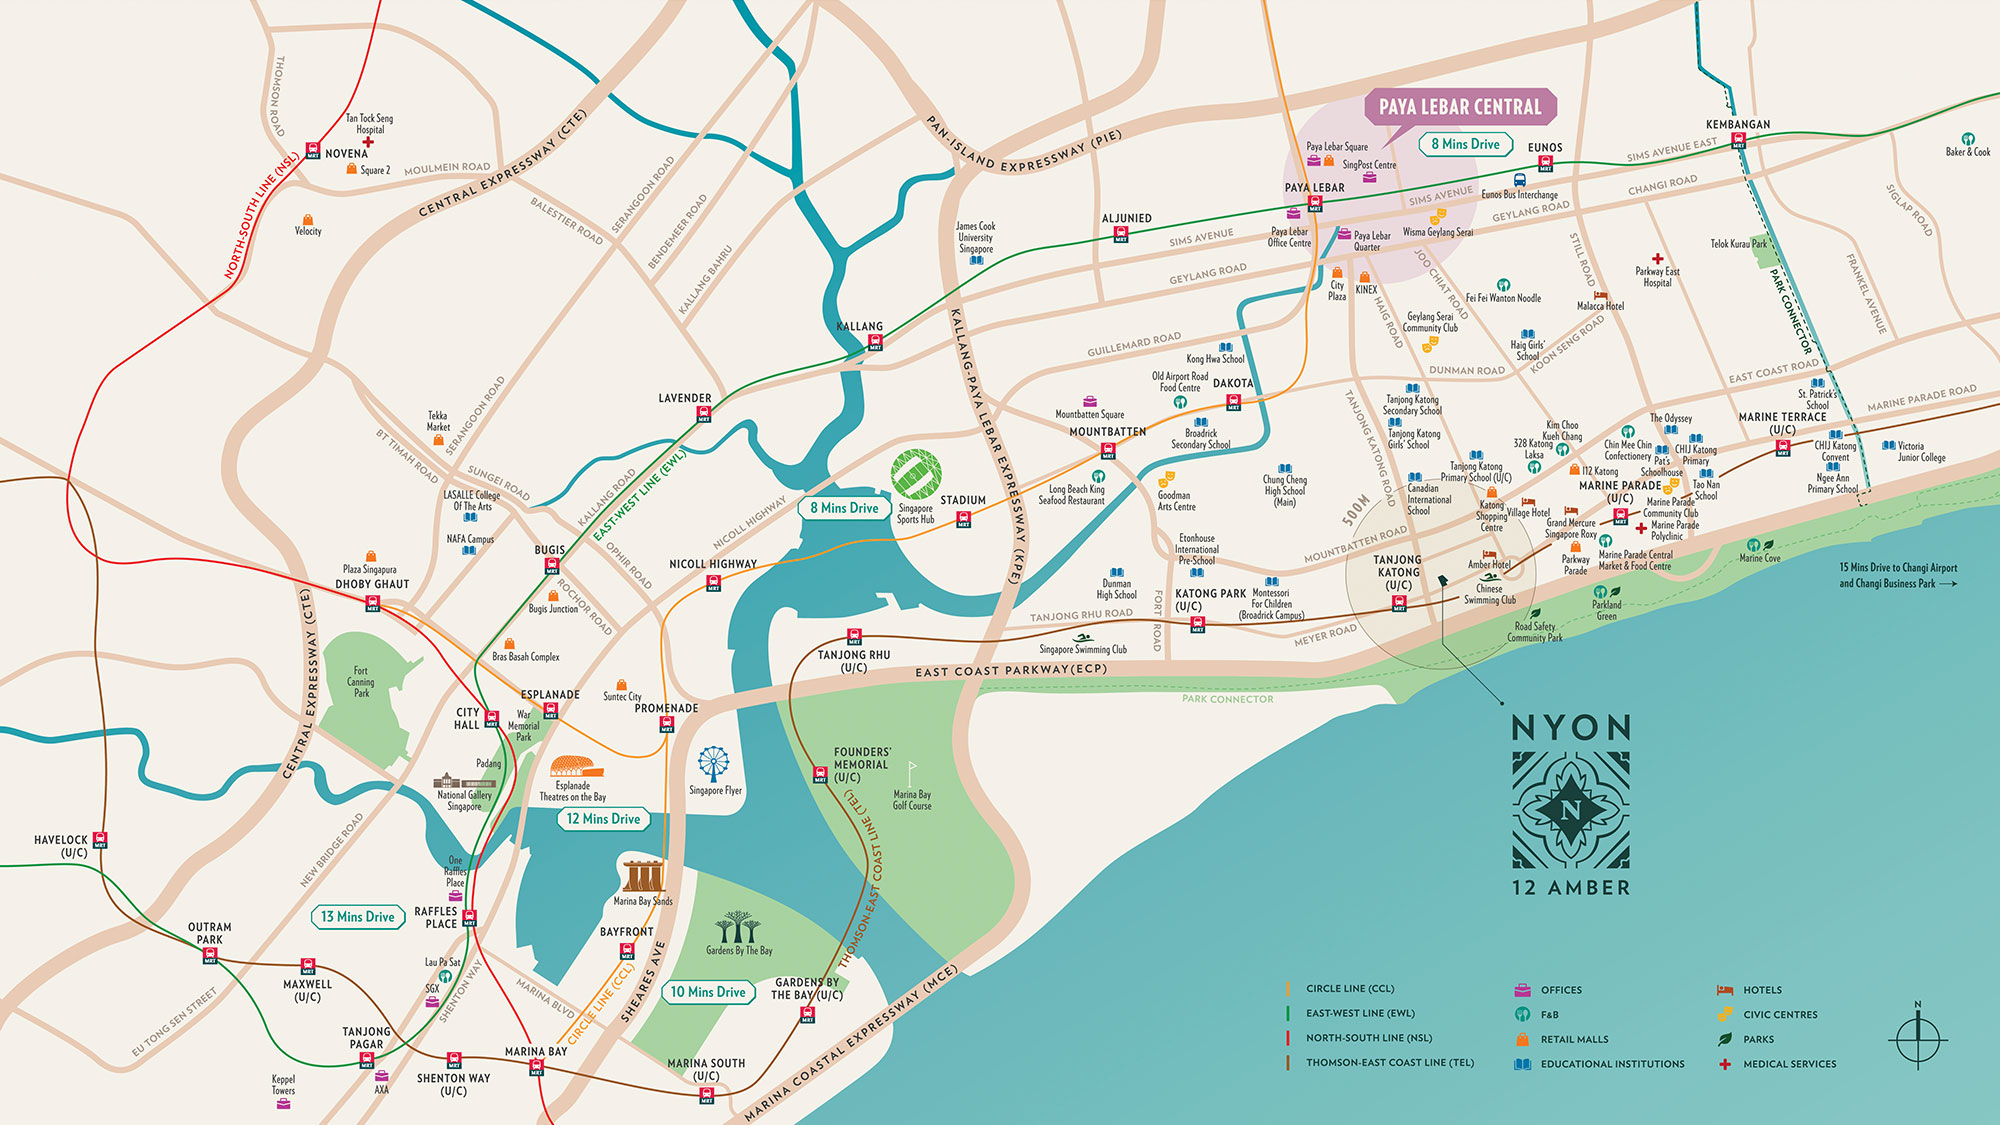 Nyon Location Map Singapore